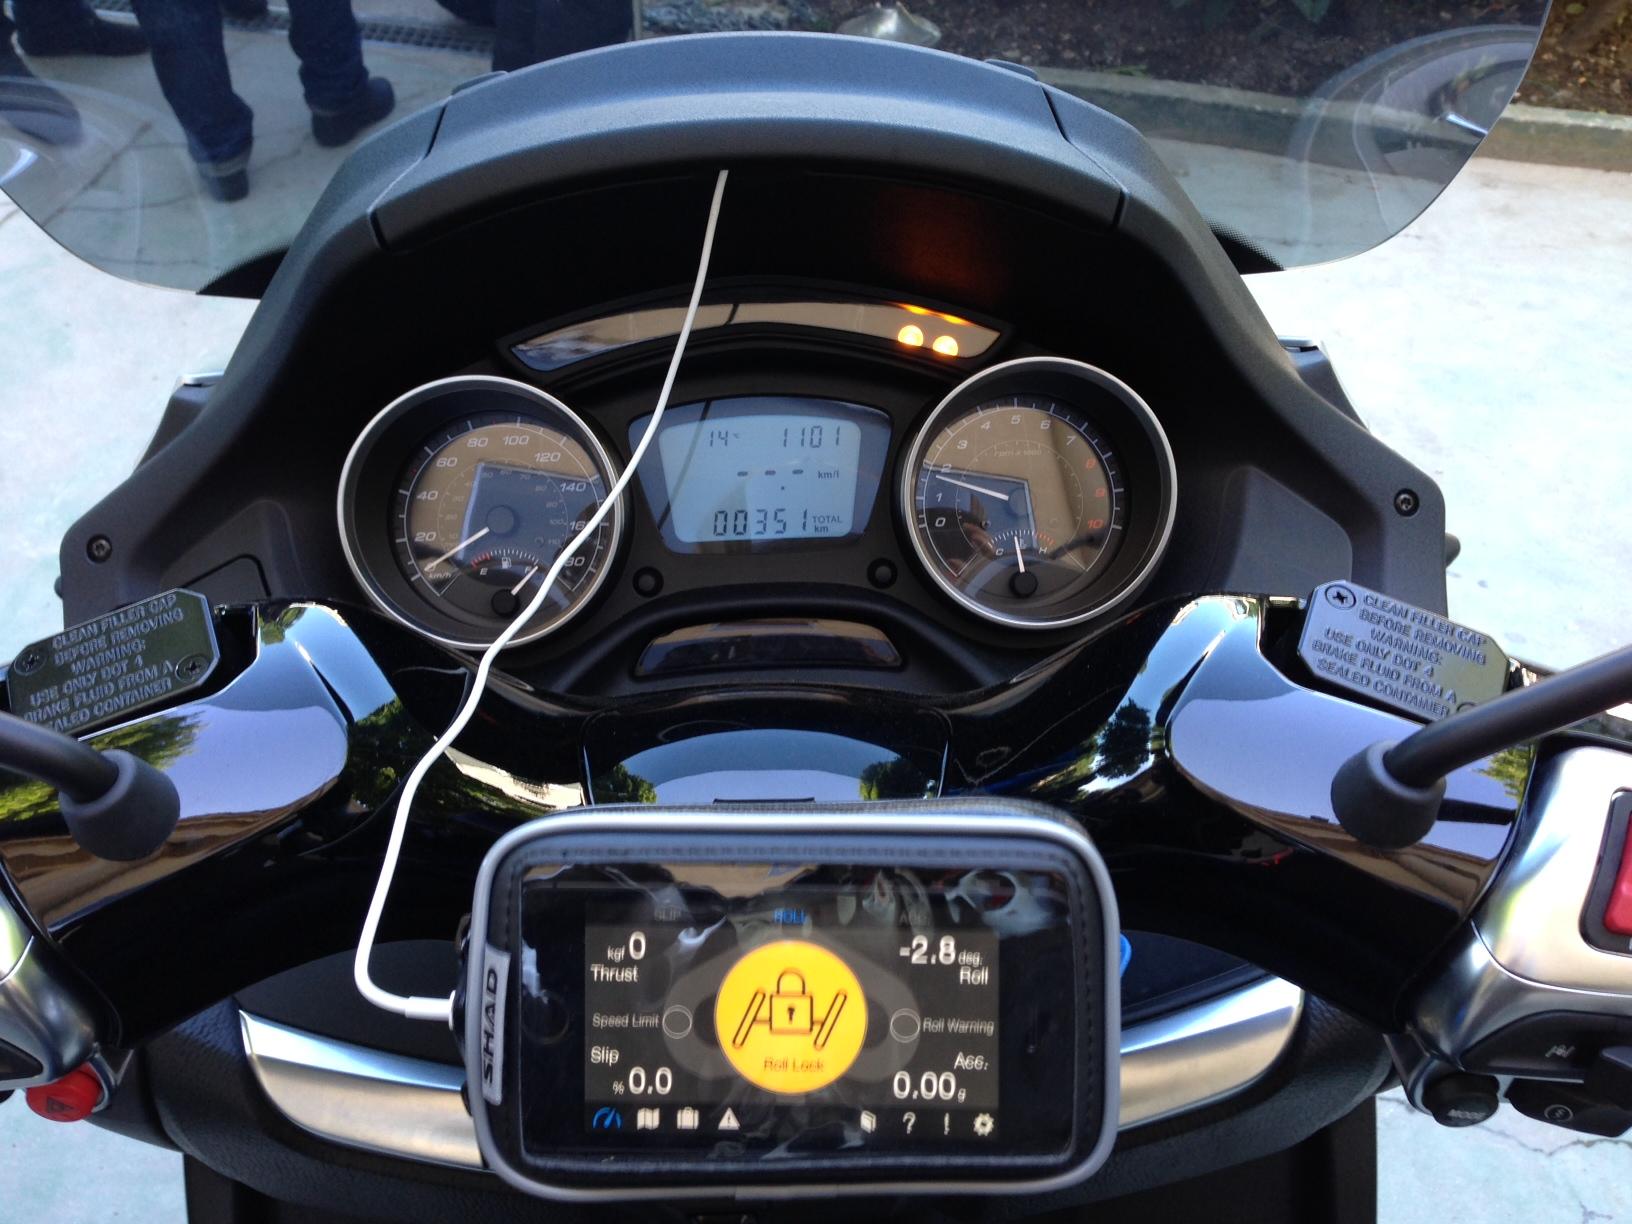 First Ride 2014 Piaggio Mp3 500 Sport R Visordown